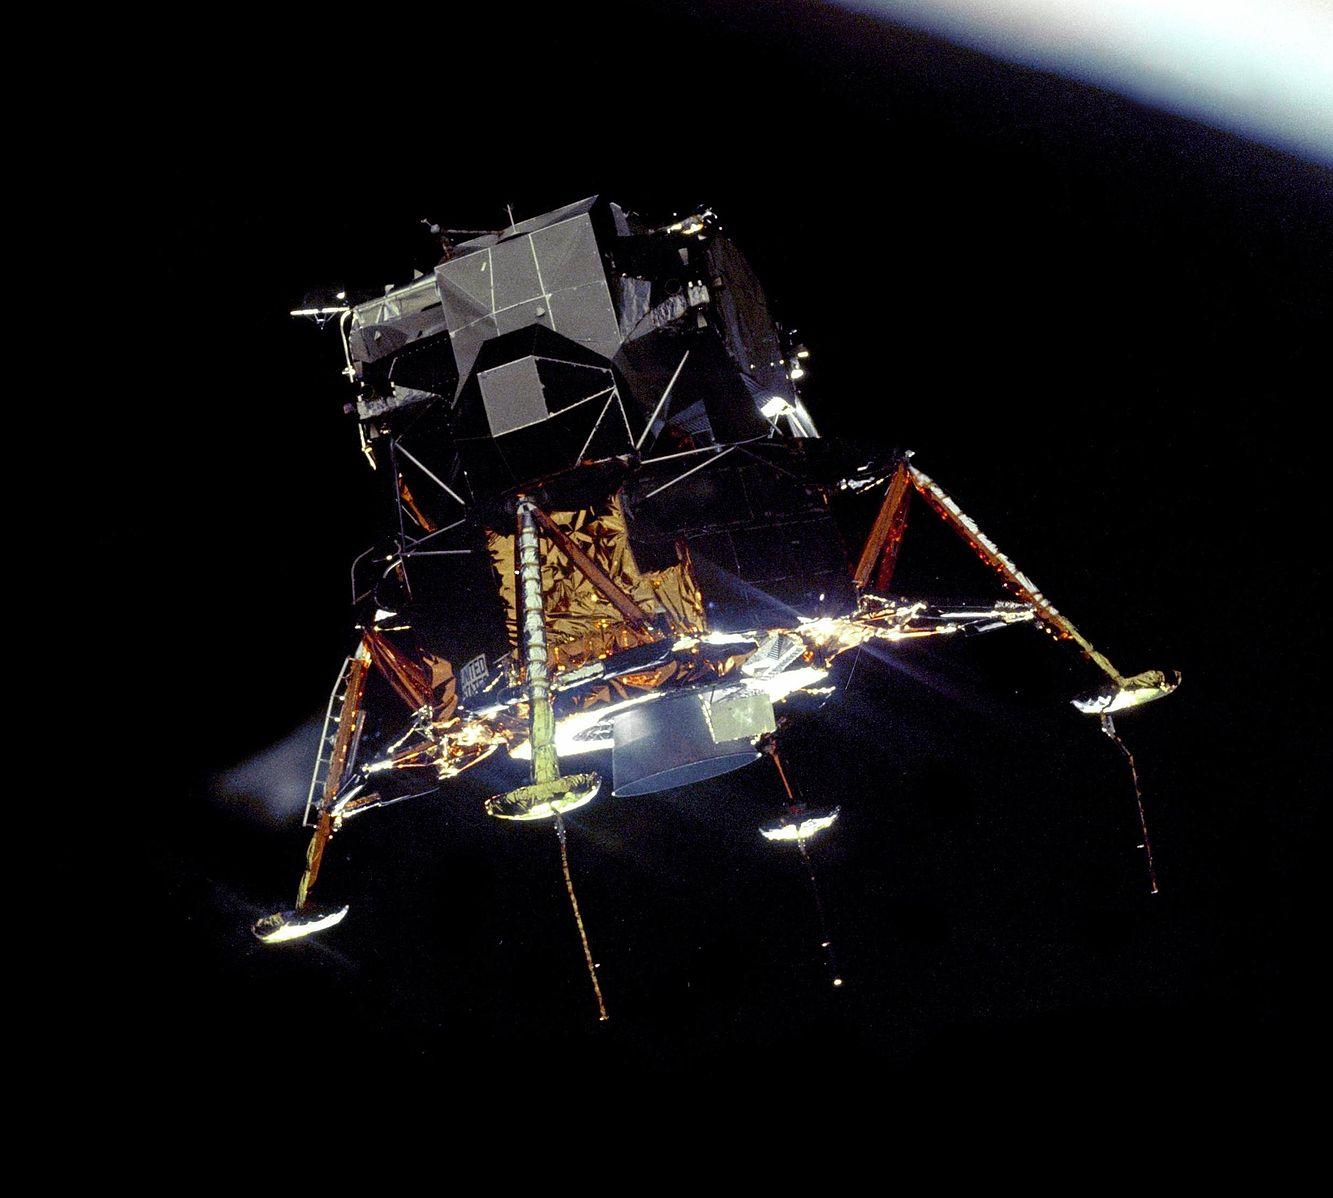 Apollo 11 Lunar Module Eagle  in Landing Configuration.   July 20, 1969   Image credit: NASA